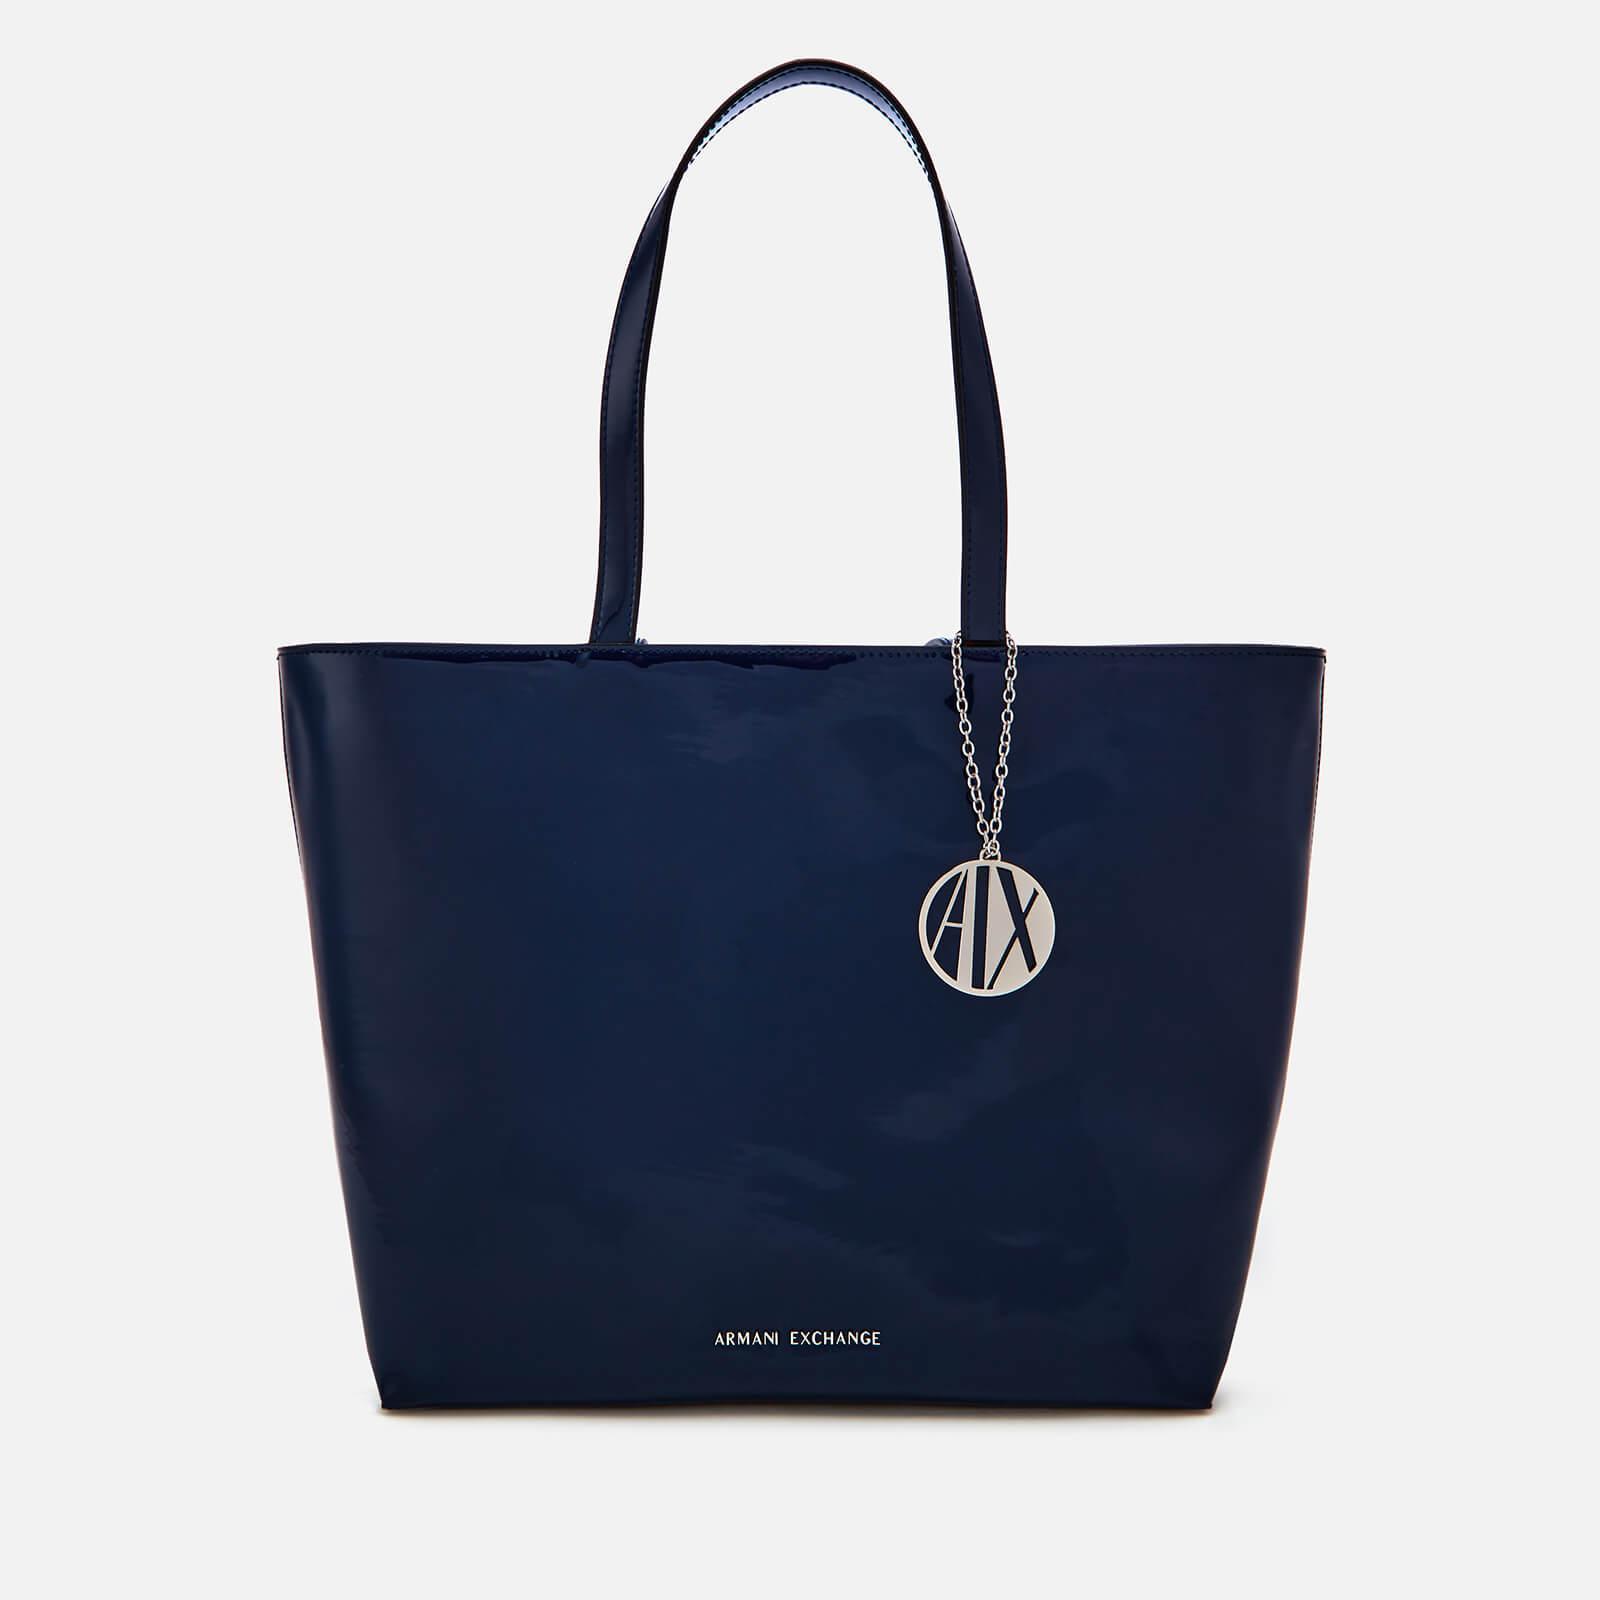 Armani Exchange - Blue Patent Shopping Tote Bag - Lyst. View fullscreen 4c78b14f6290d